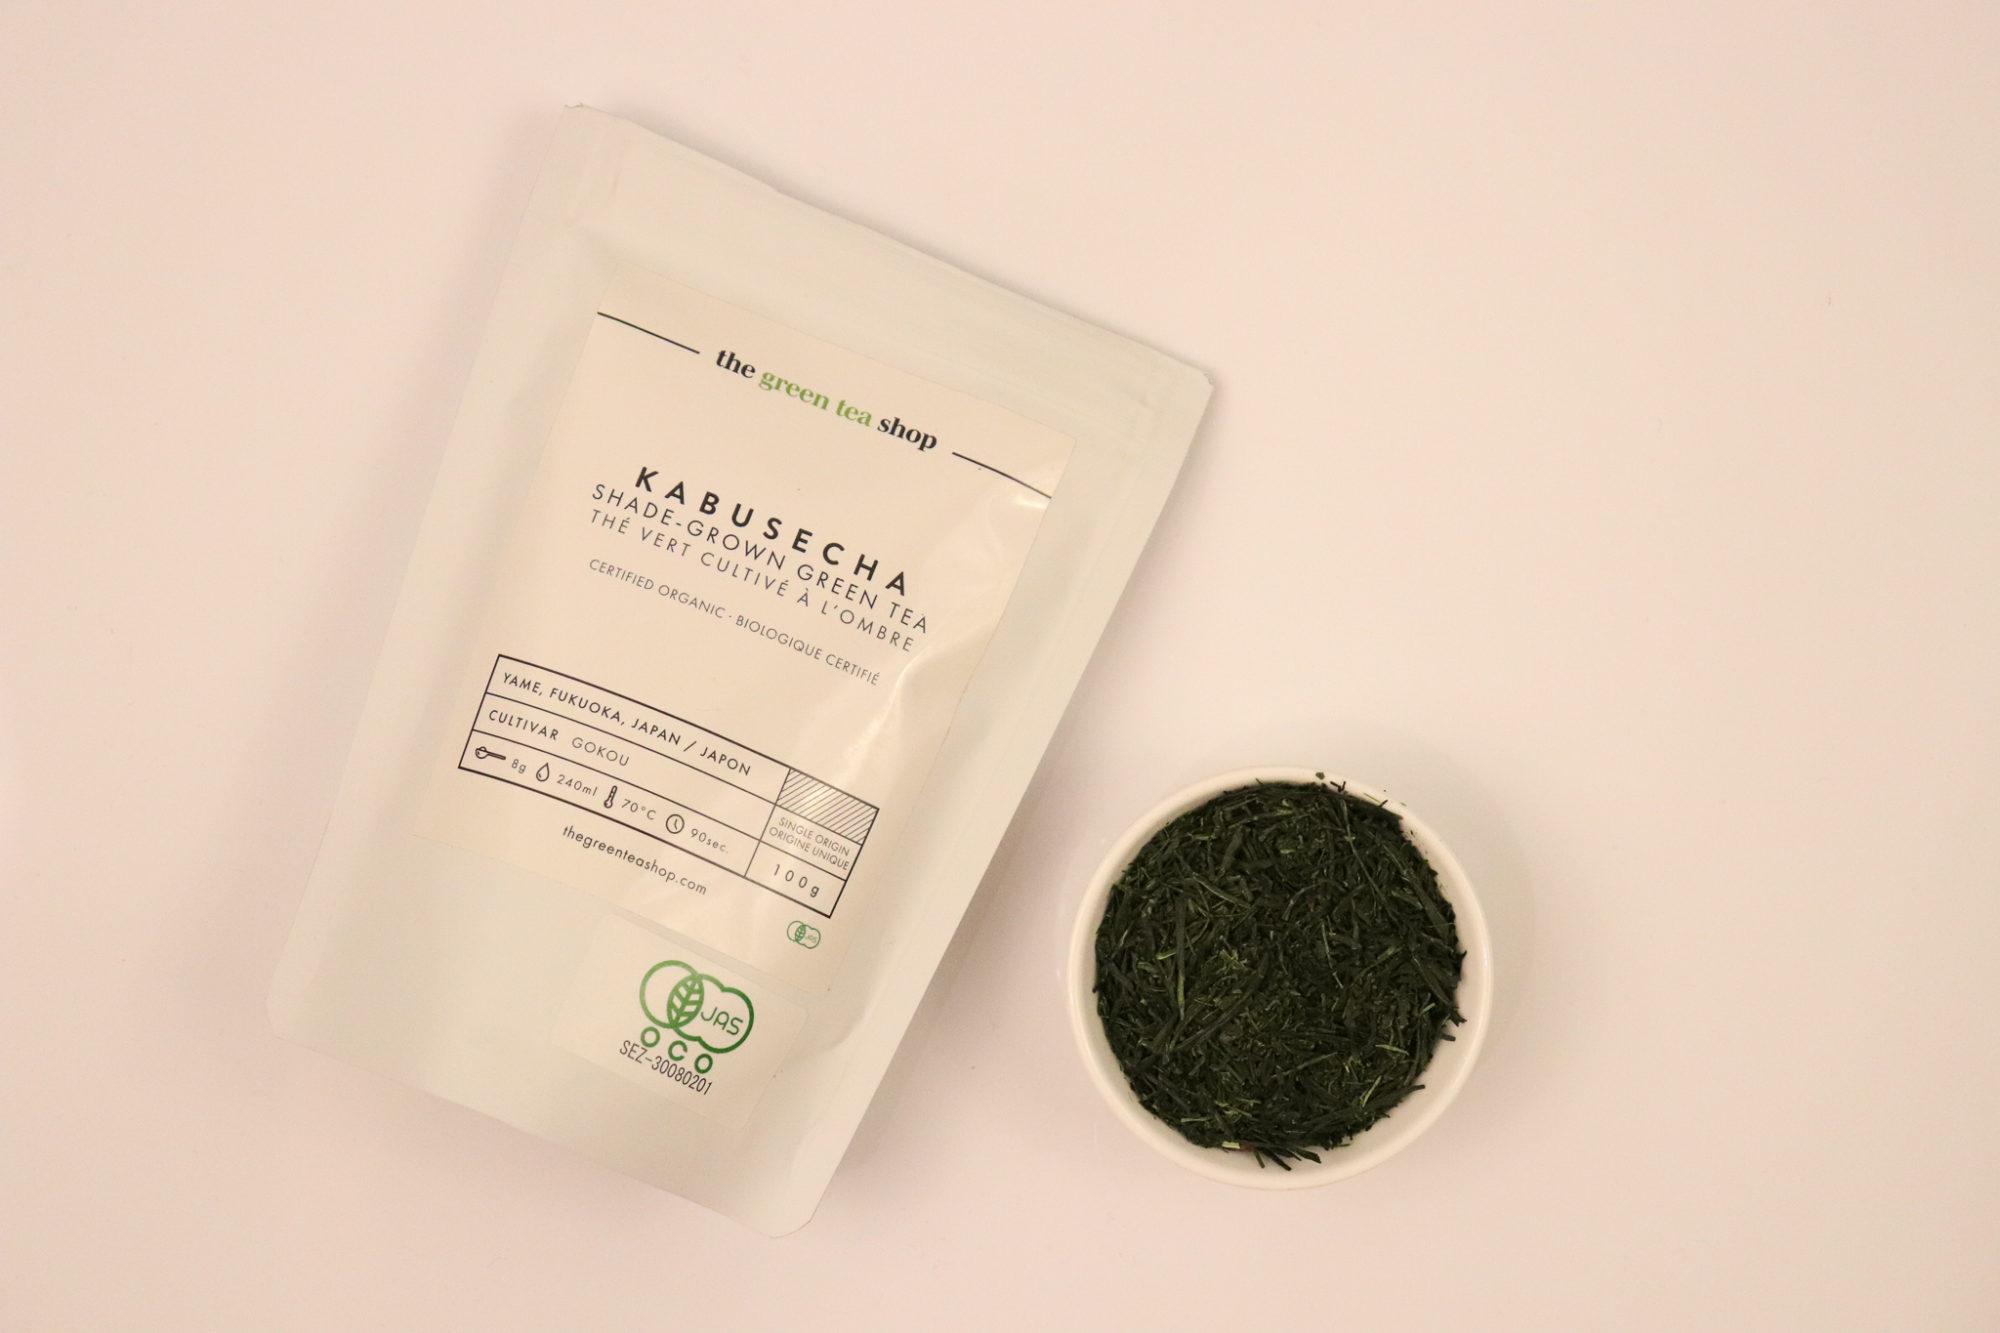 The Green Tea Shop Kabusecha – Gokou